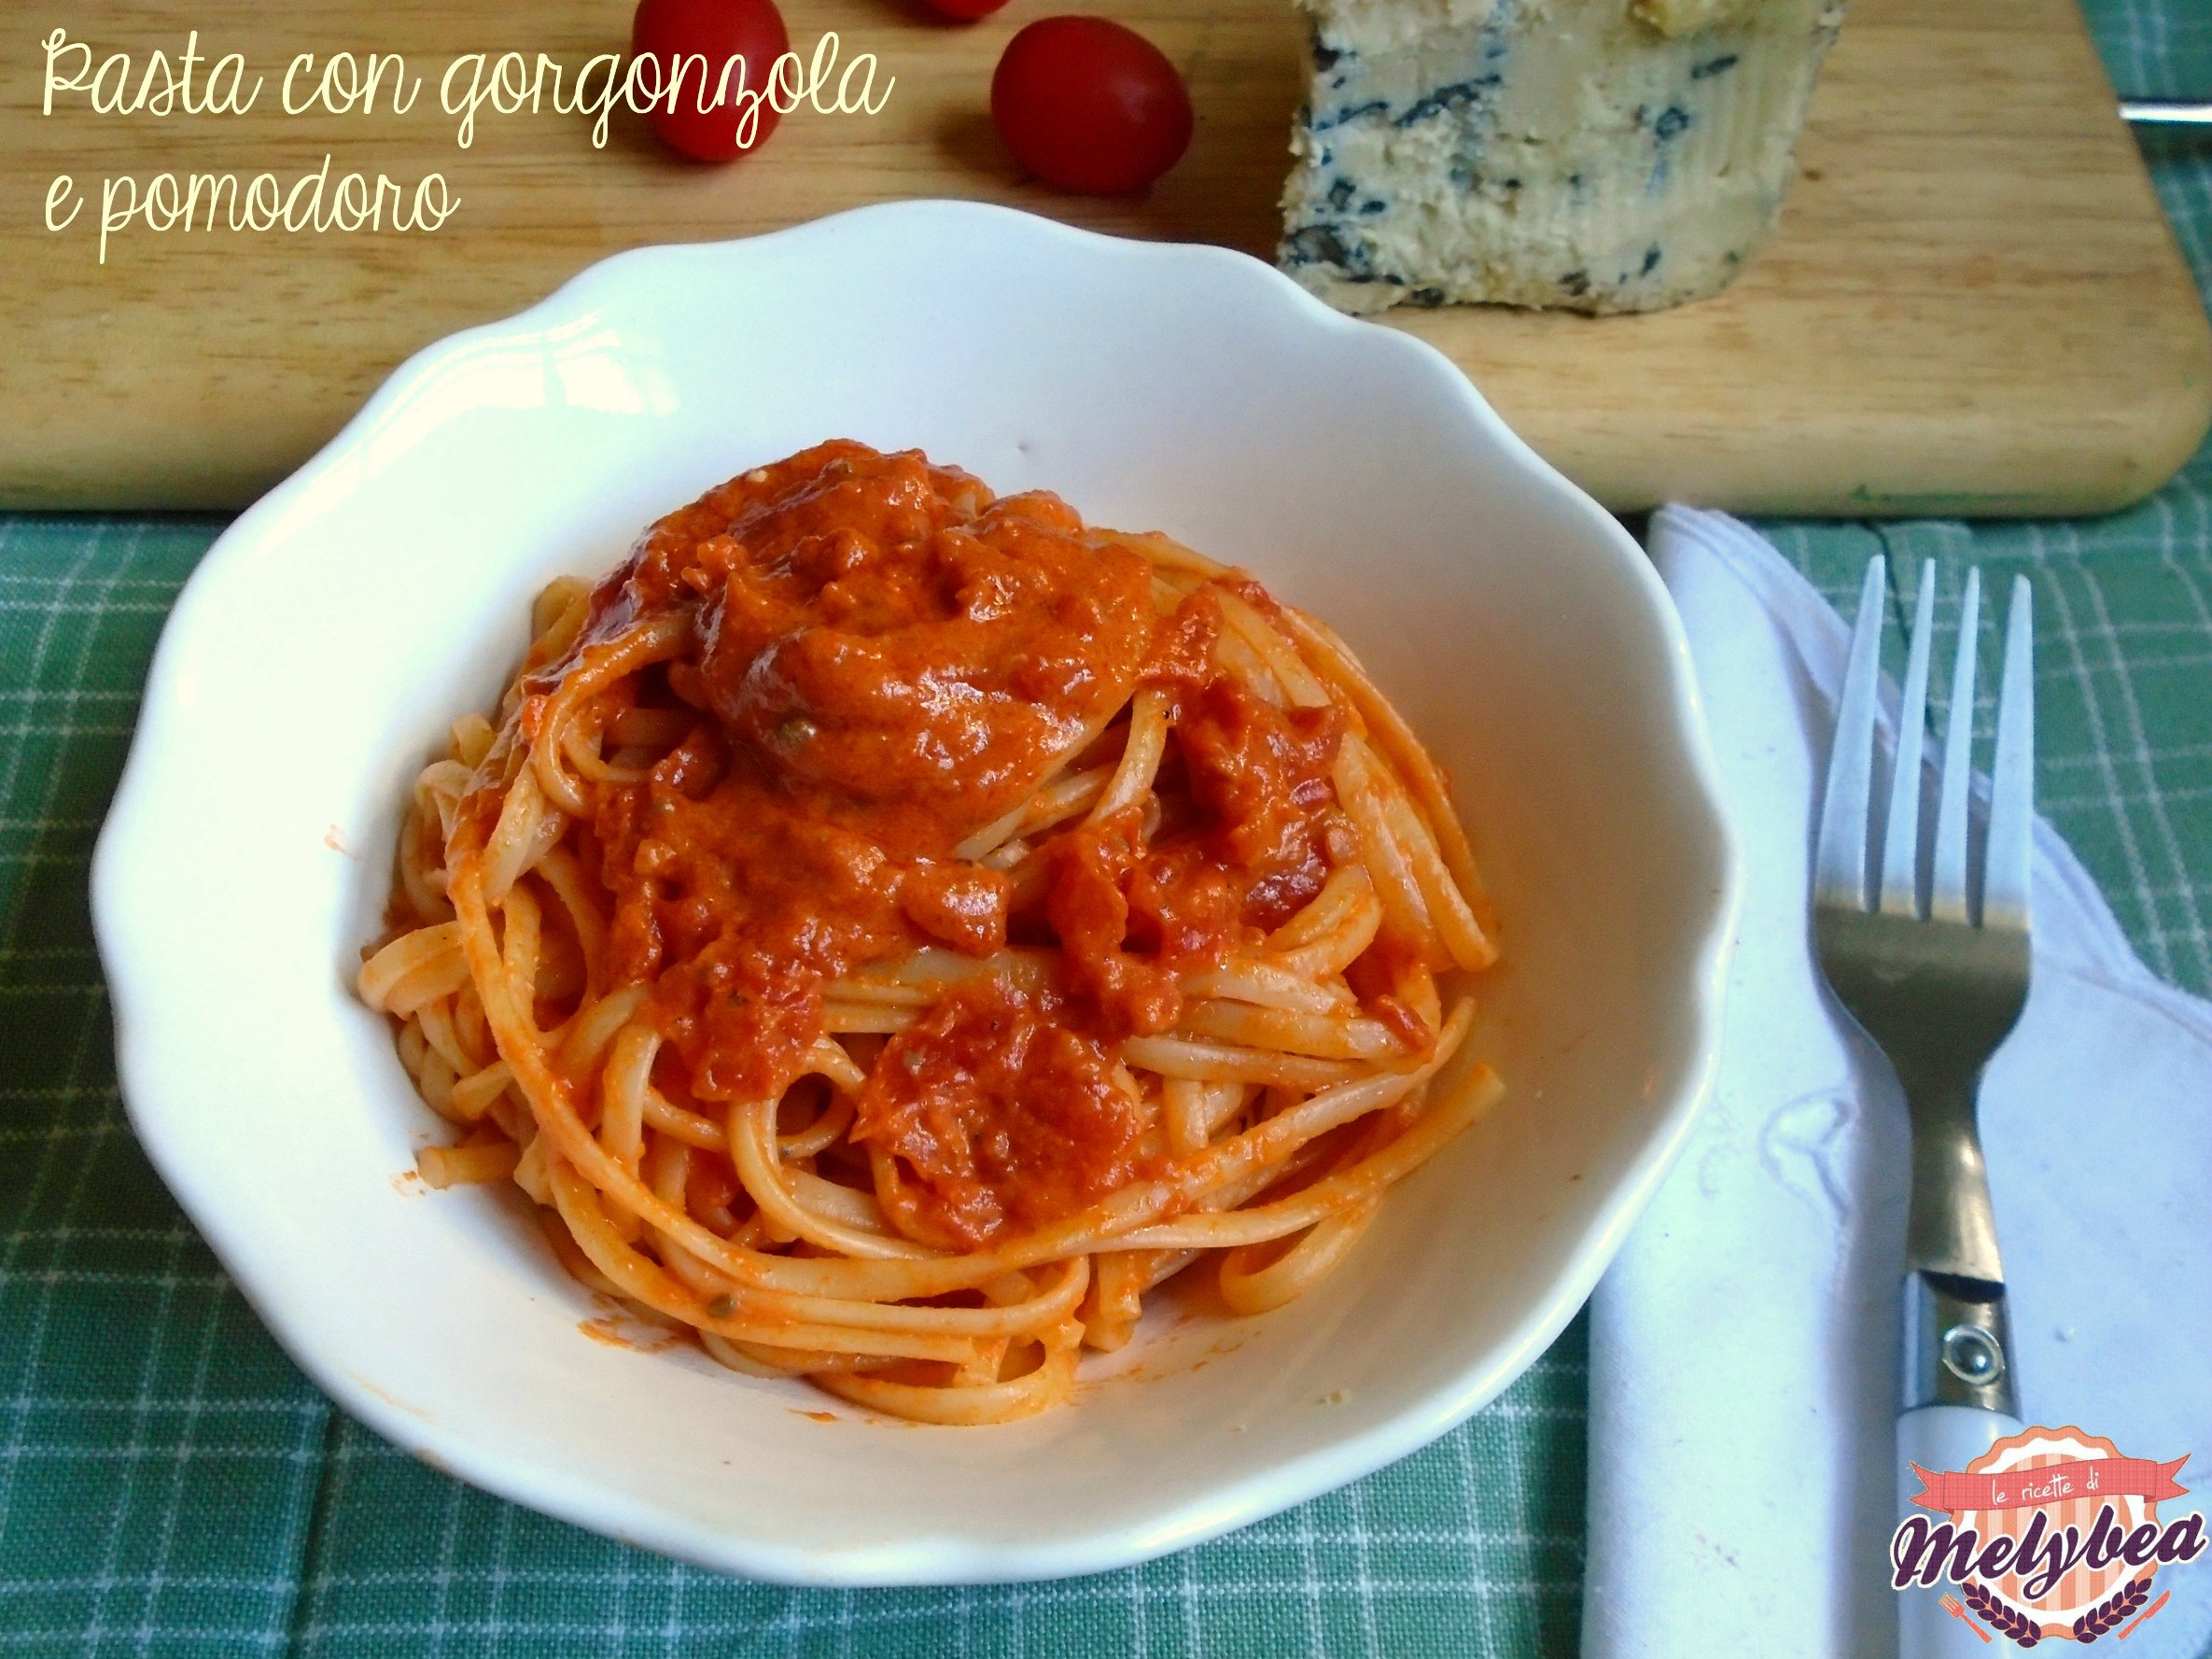 pasta con gorgonzola e pomodoro